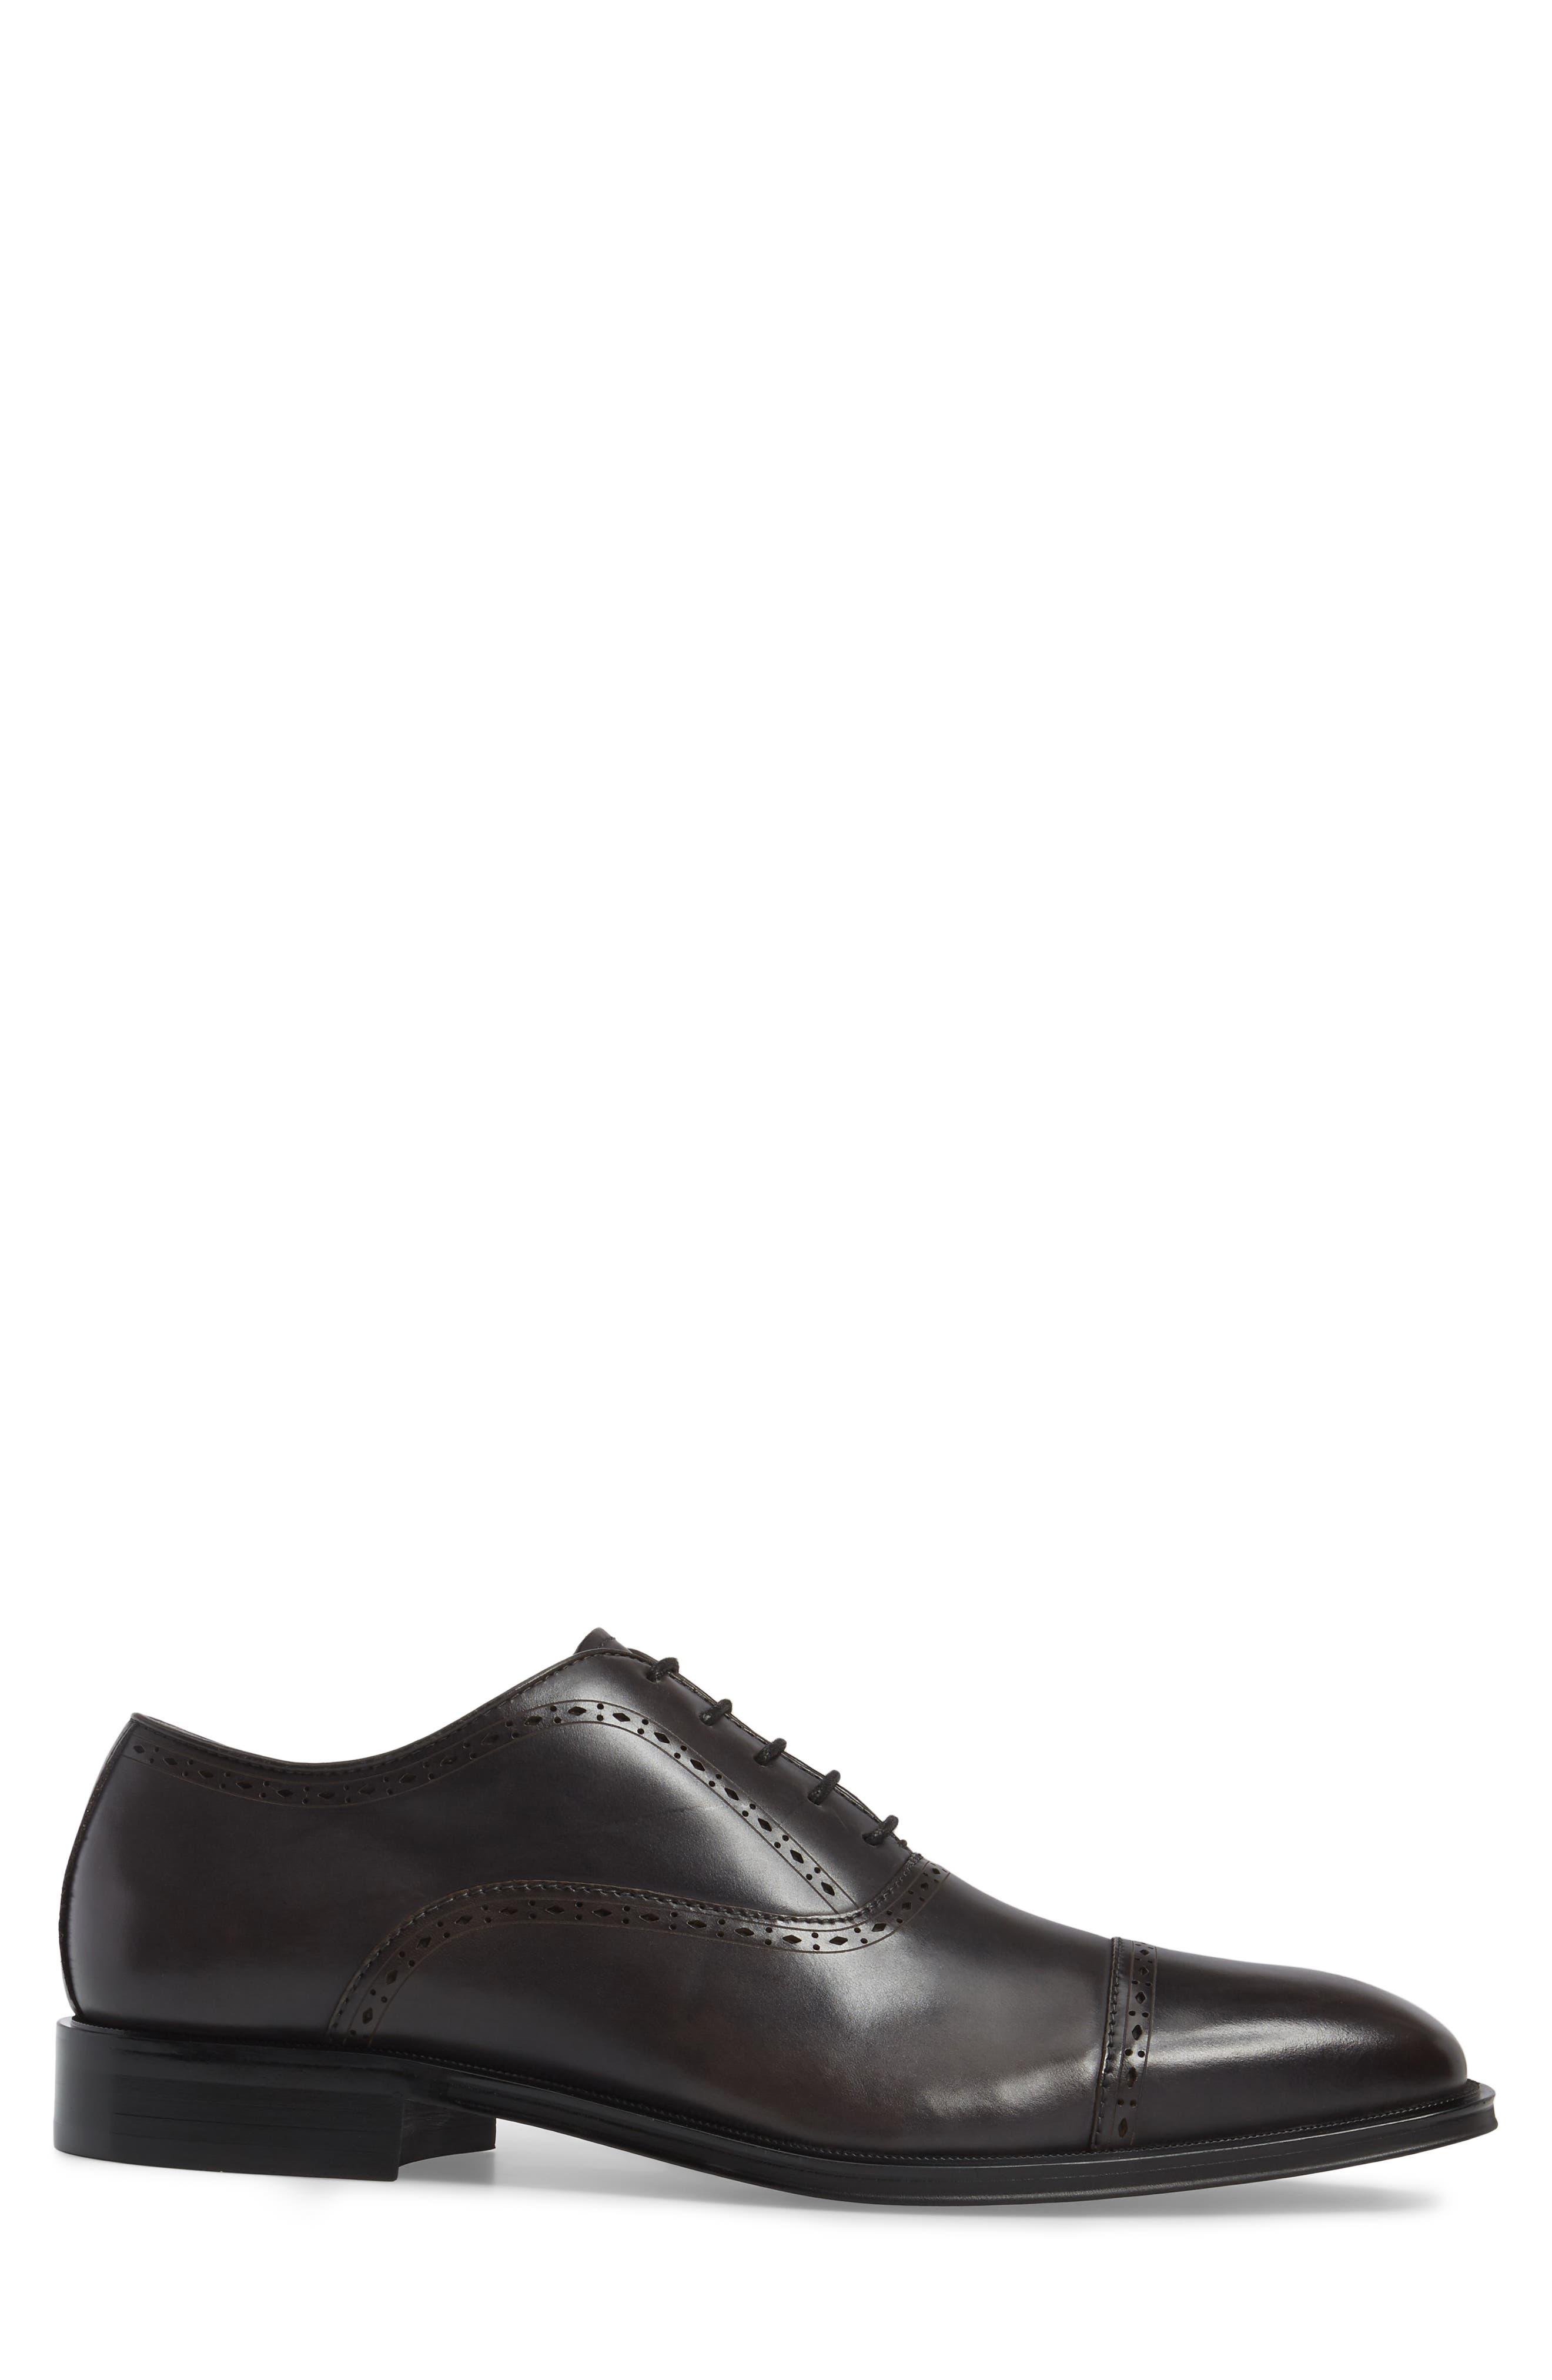 Alternate Image 3  - Kenneth Cole New York Design 10221 Cap Toe Oxford (Men)